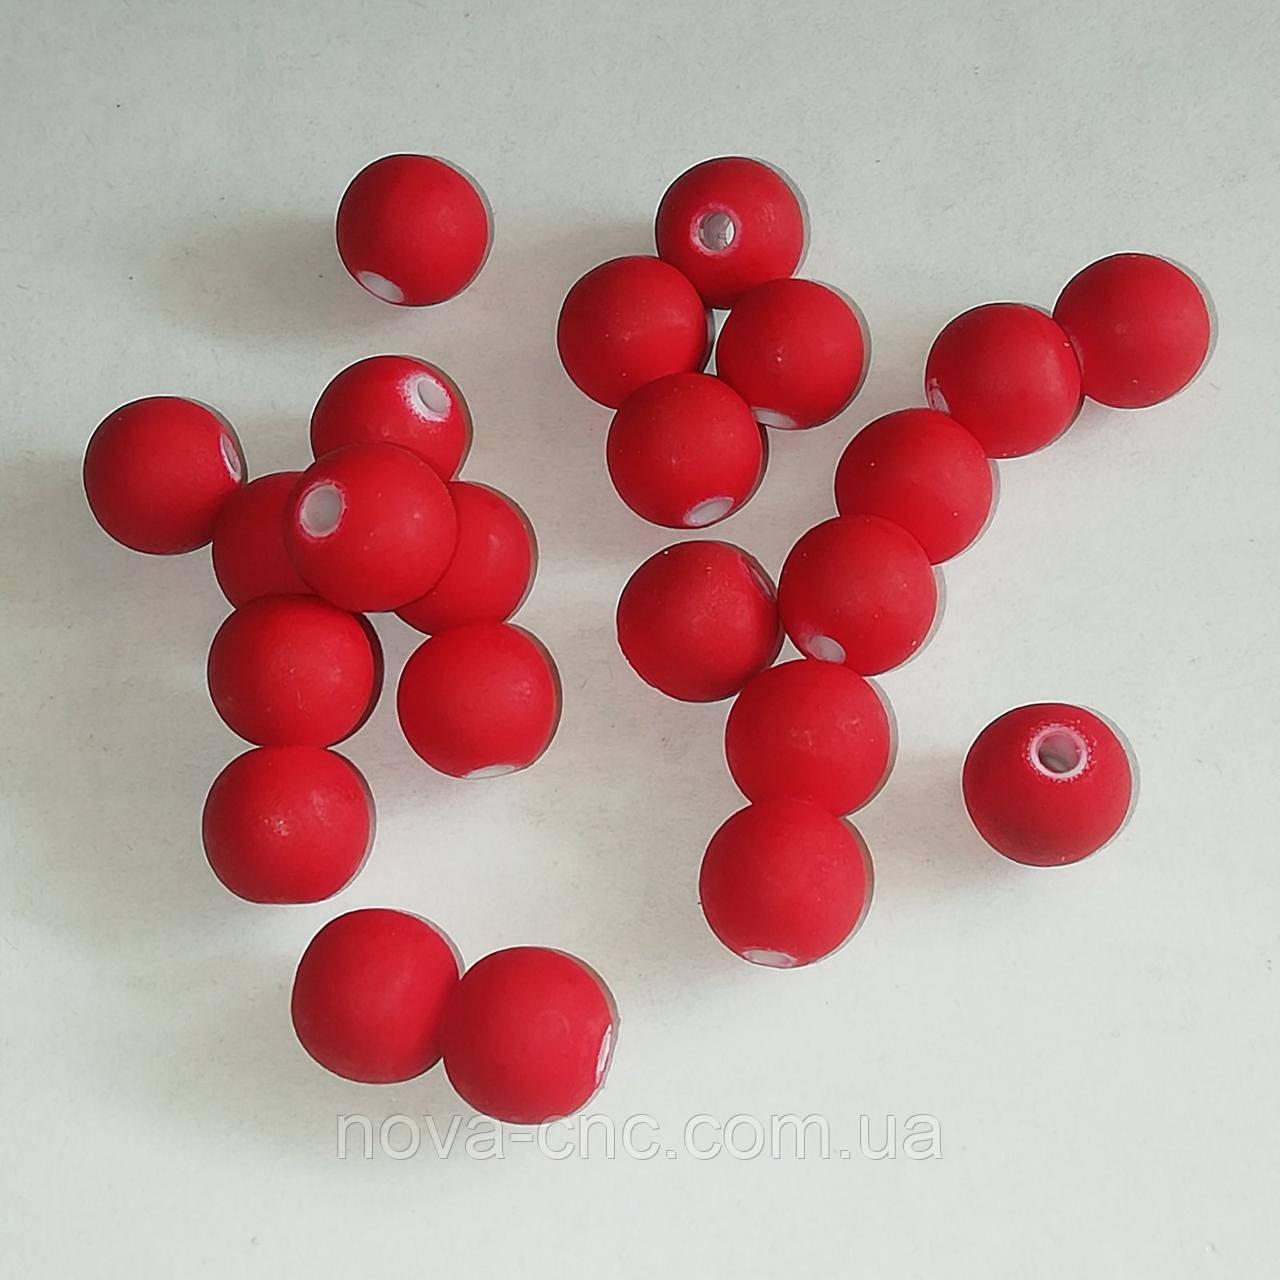 "Бусины ""Шар гладкий"" пластик красный 8 мм 500 грамм"